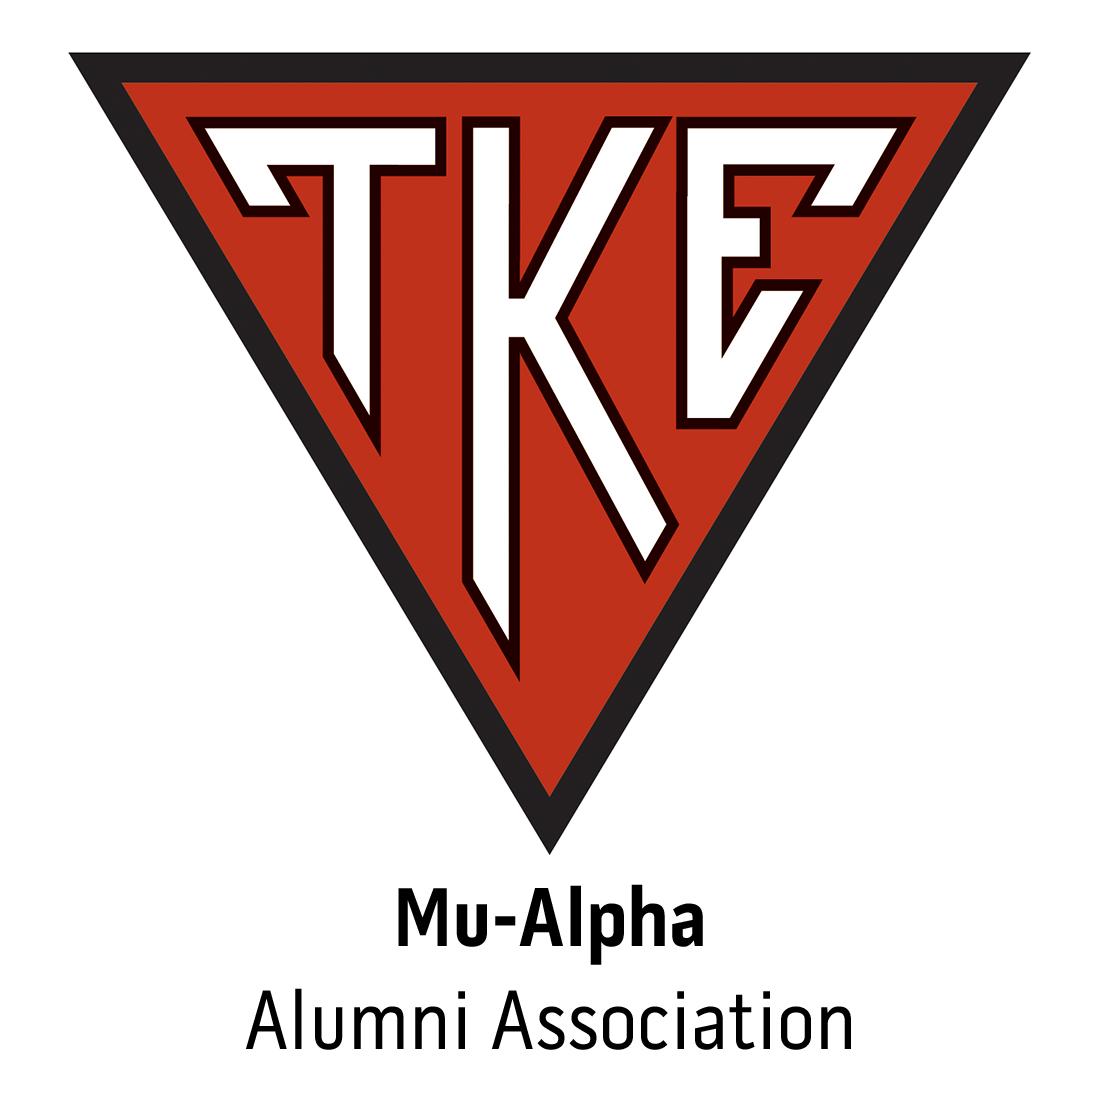 Mu-Alpha Alumni Association at West Chester University